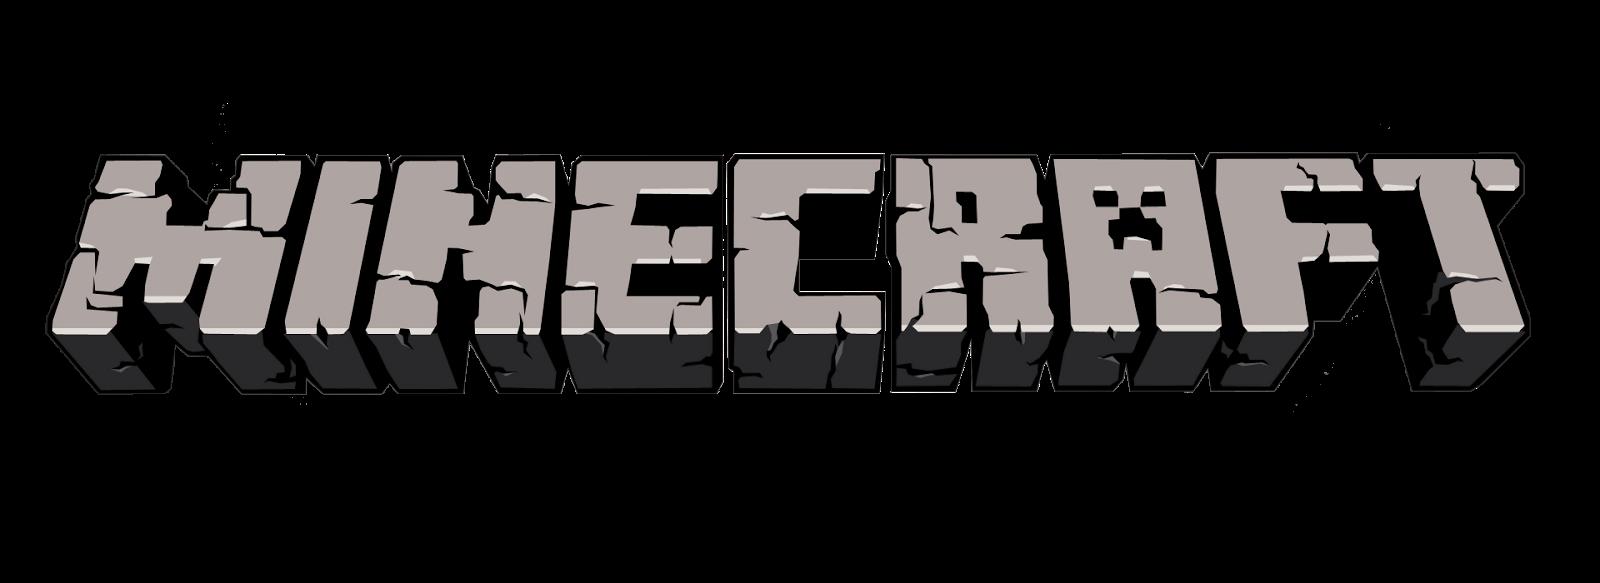 Minecraft logo - Minecraft - Alegria pra todos